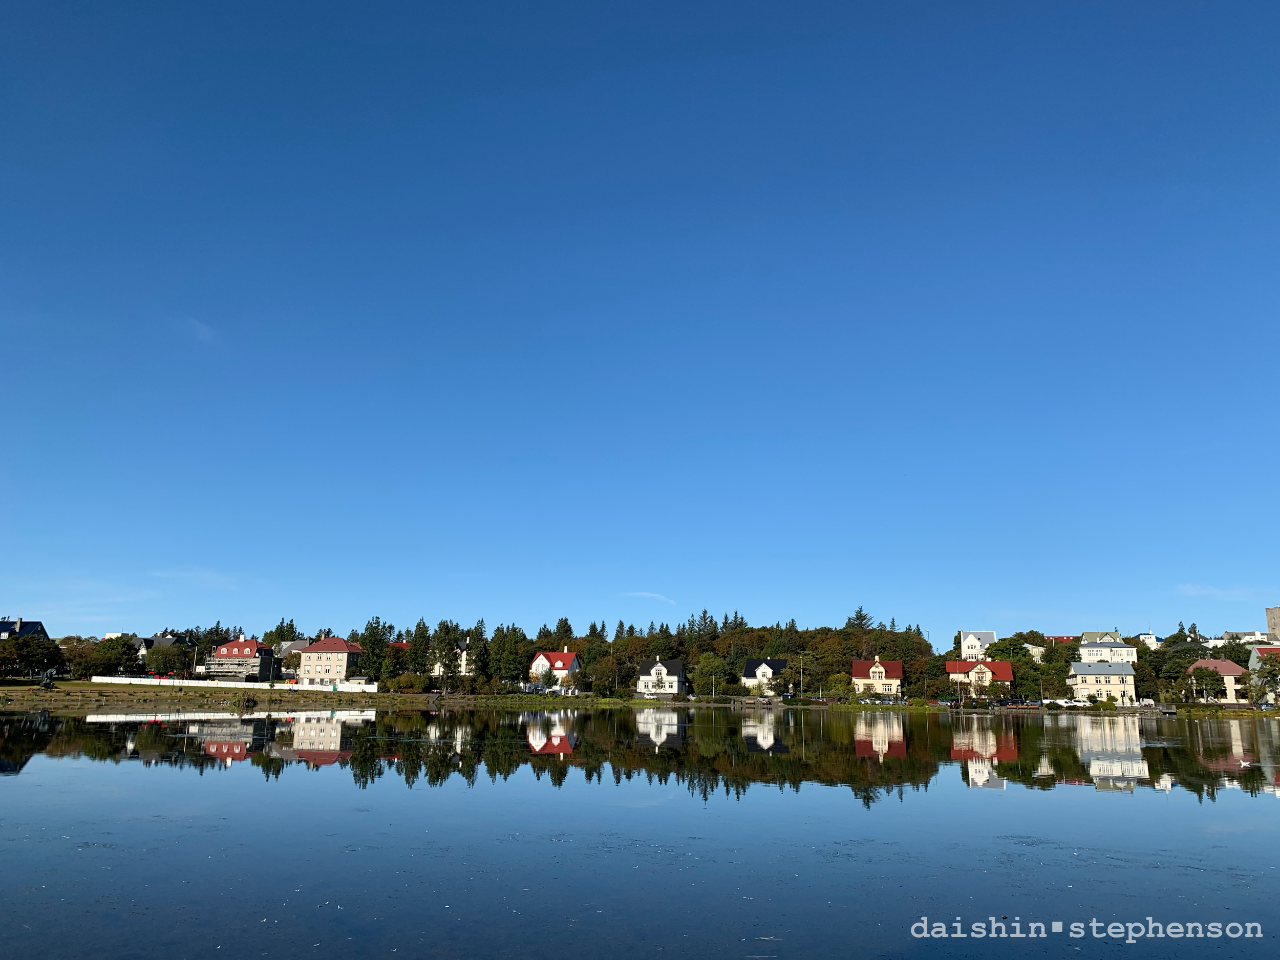 reykjavik city reflected in lake